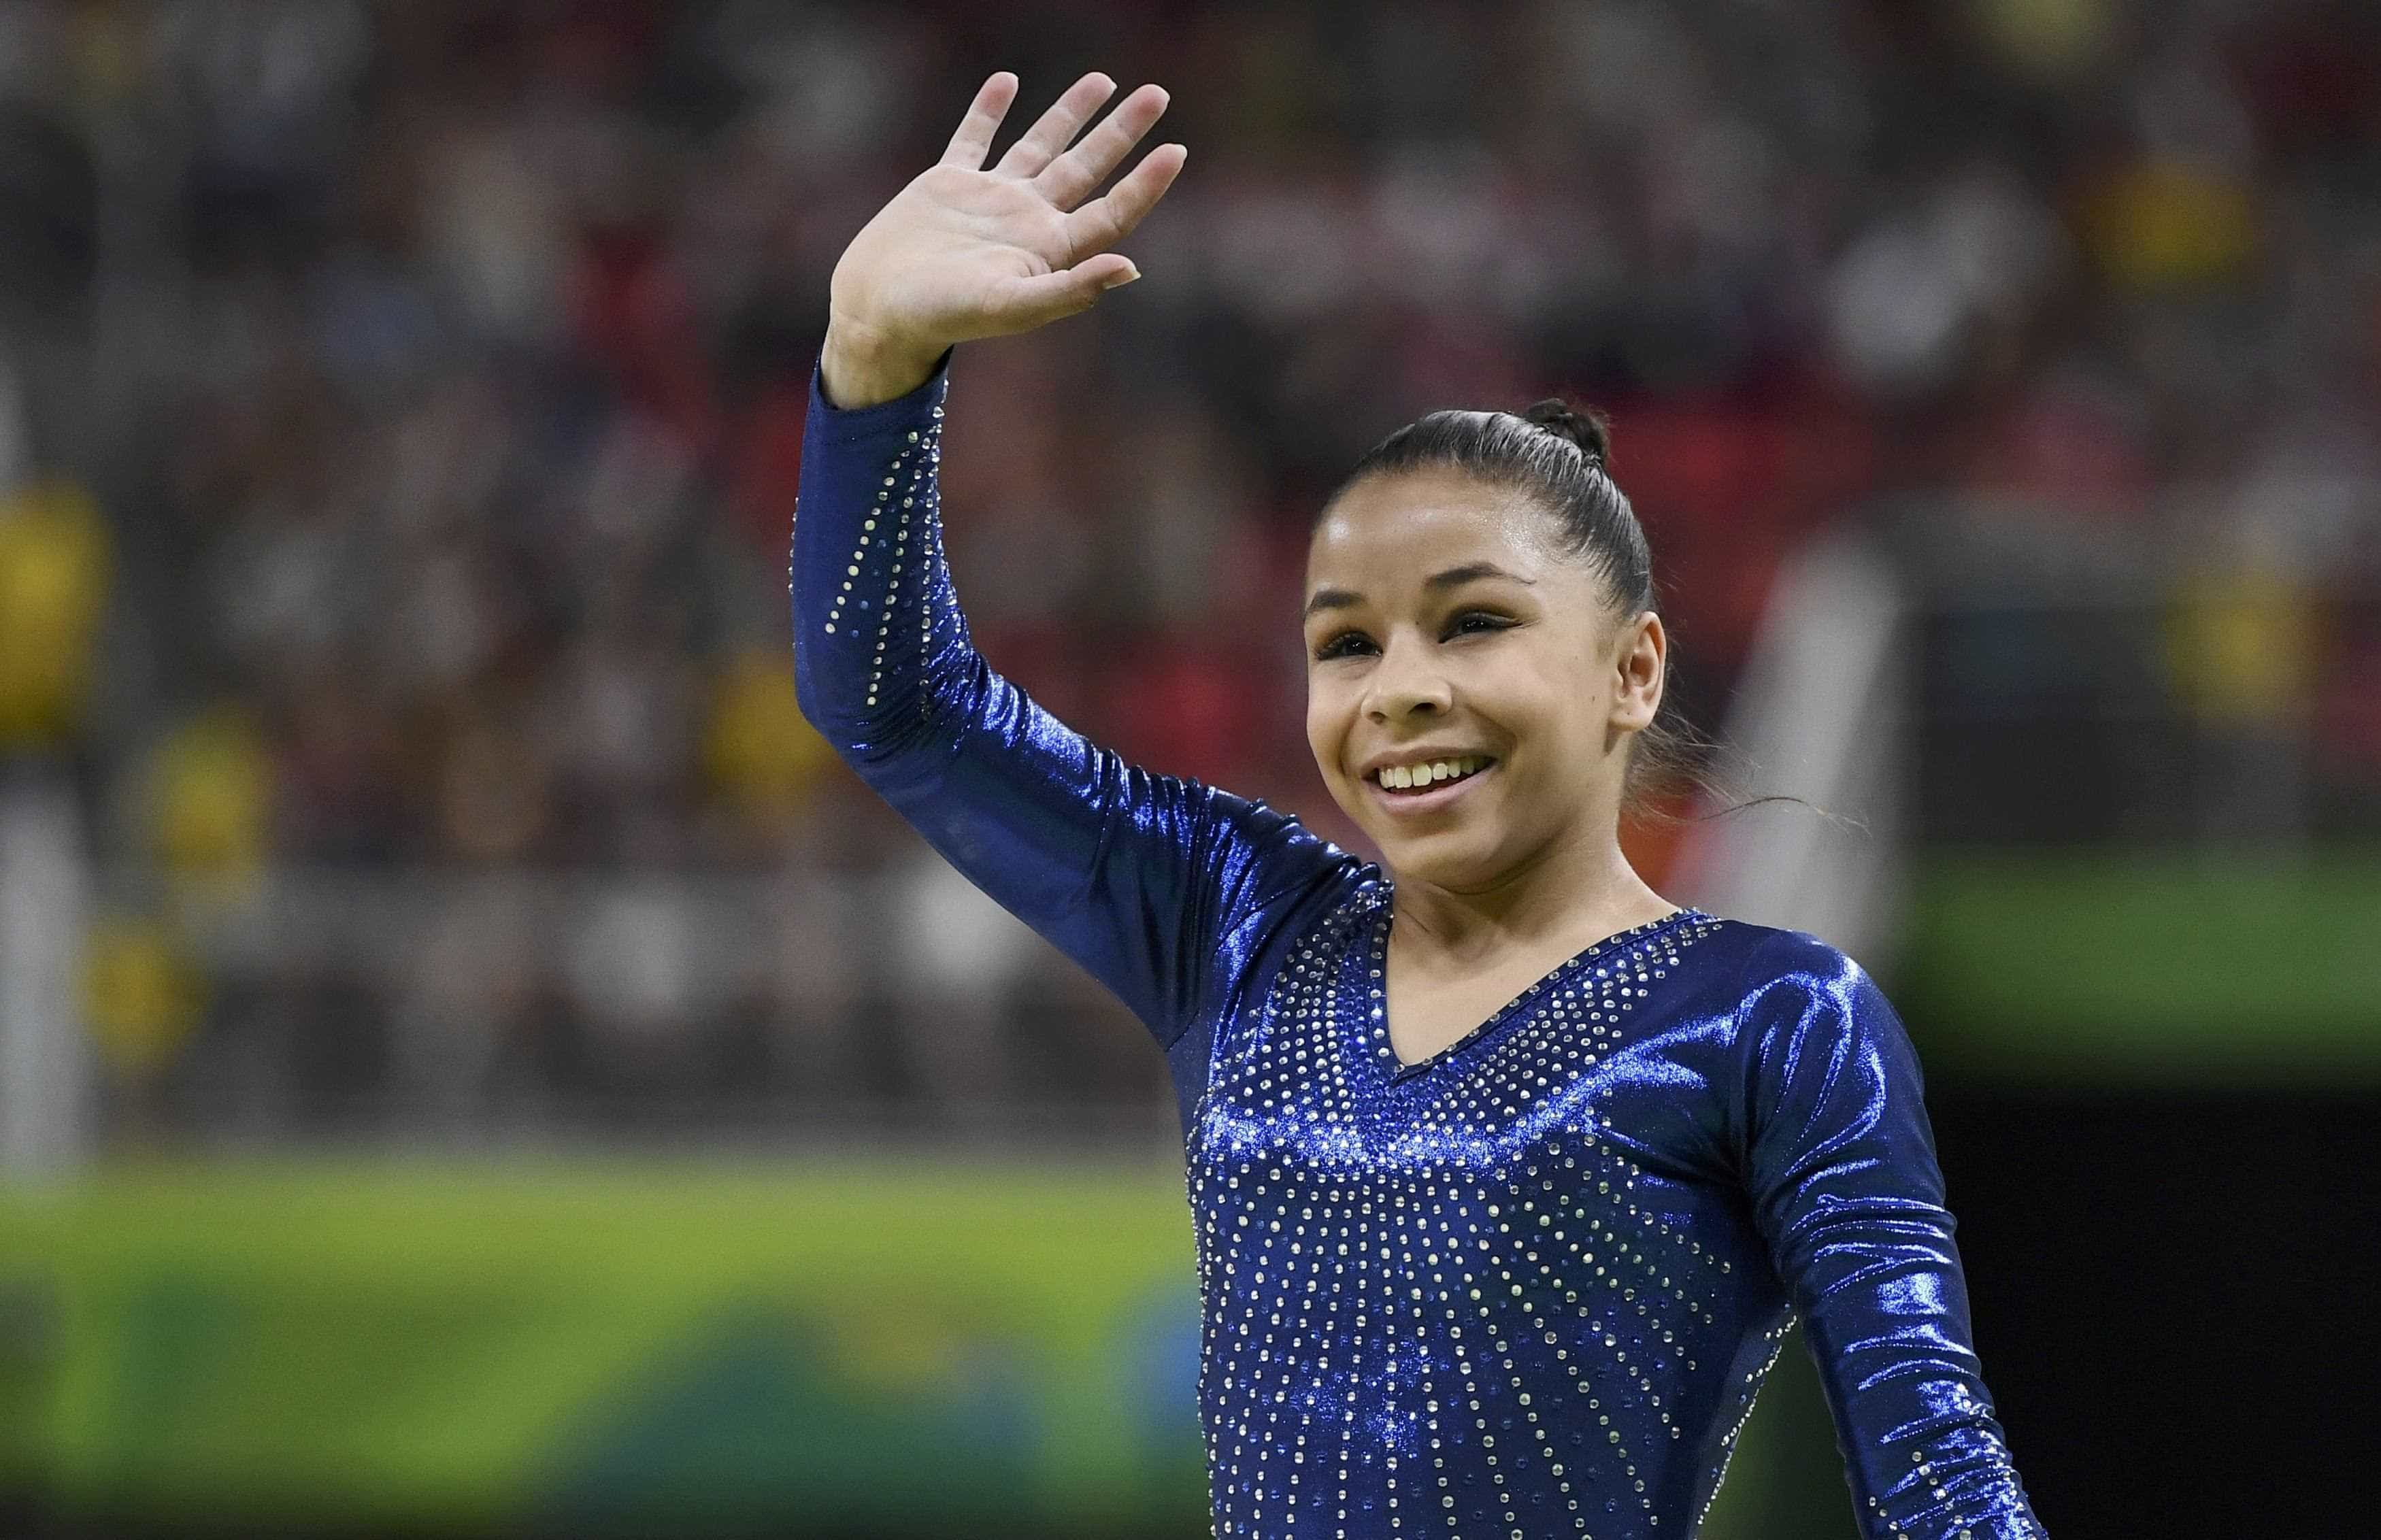 Equipe brasileira vai à final do Mundial de ginástica artística